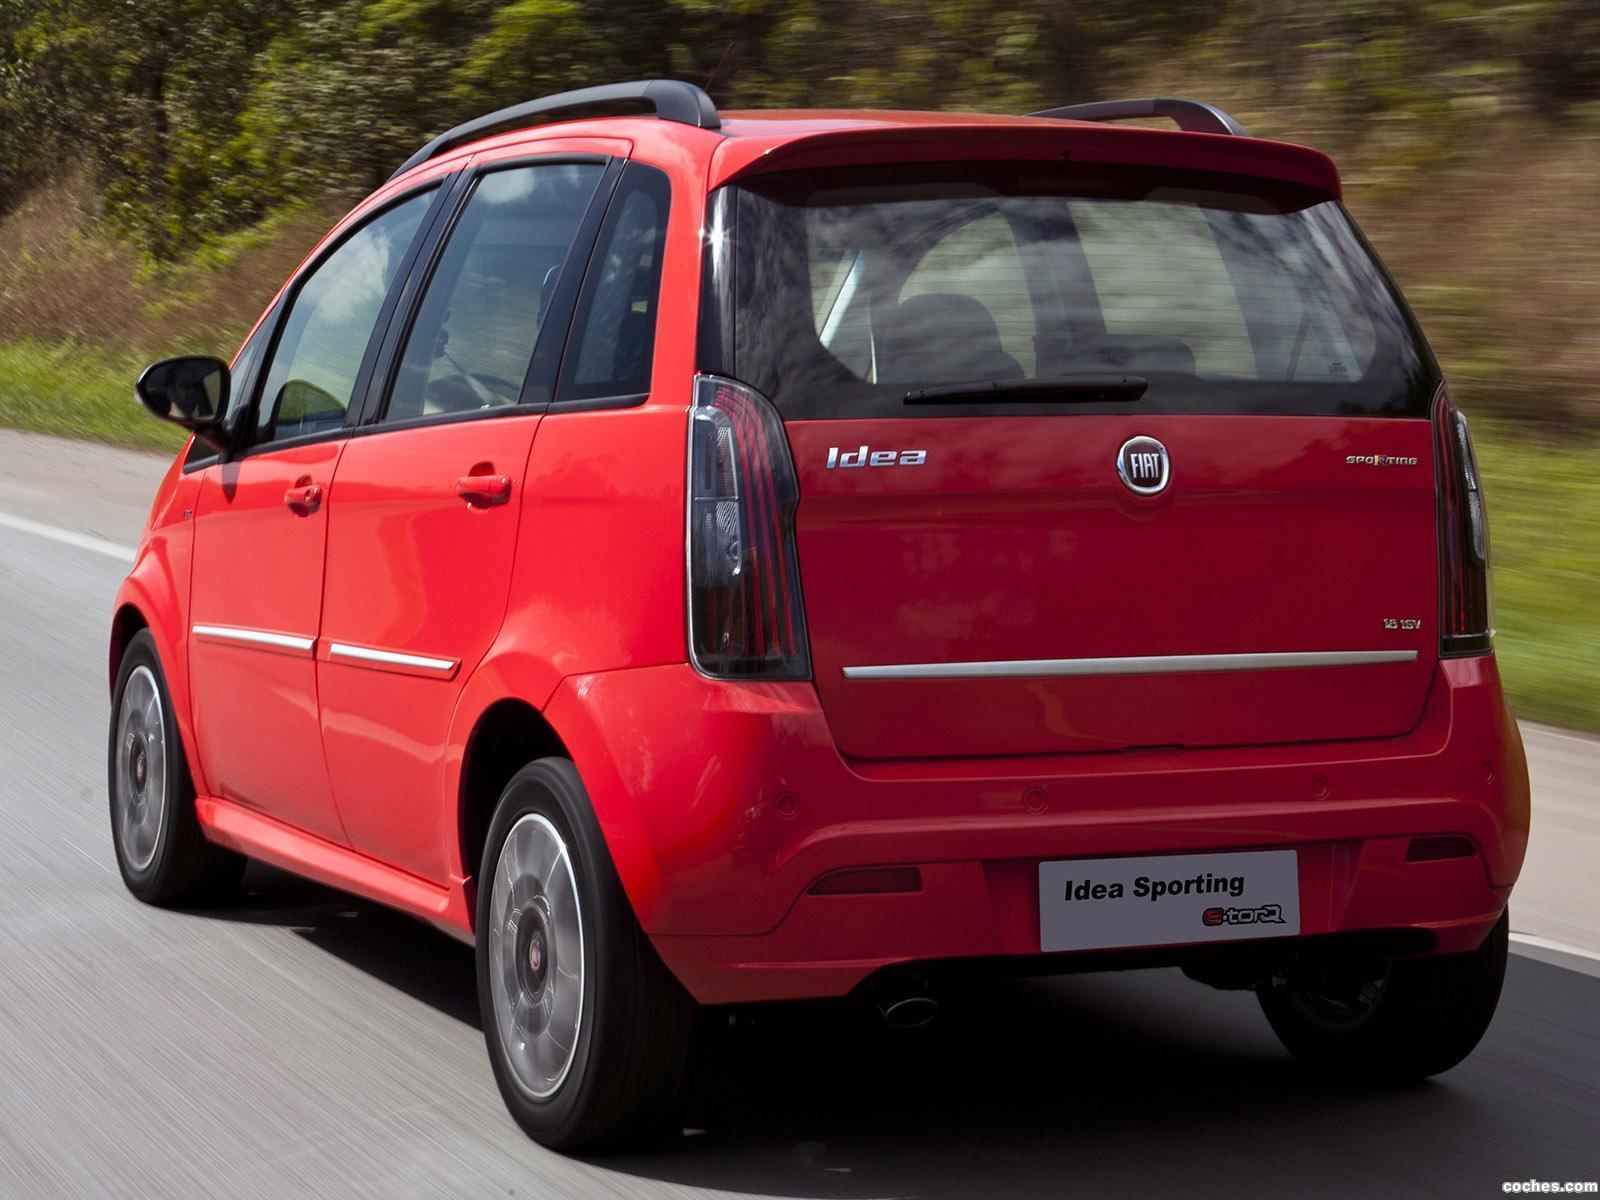 Foto 3 de Fiat Idea Sporting 2010